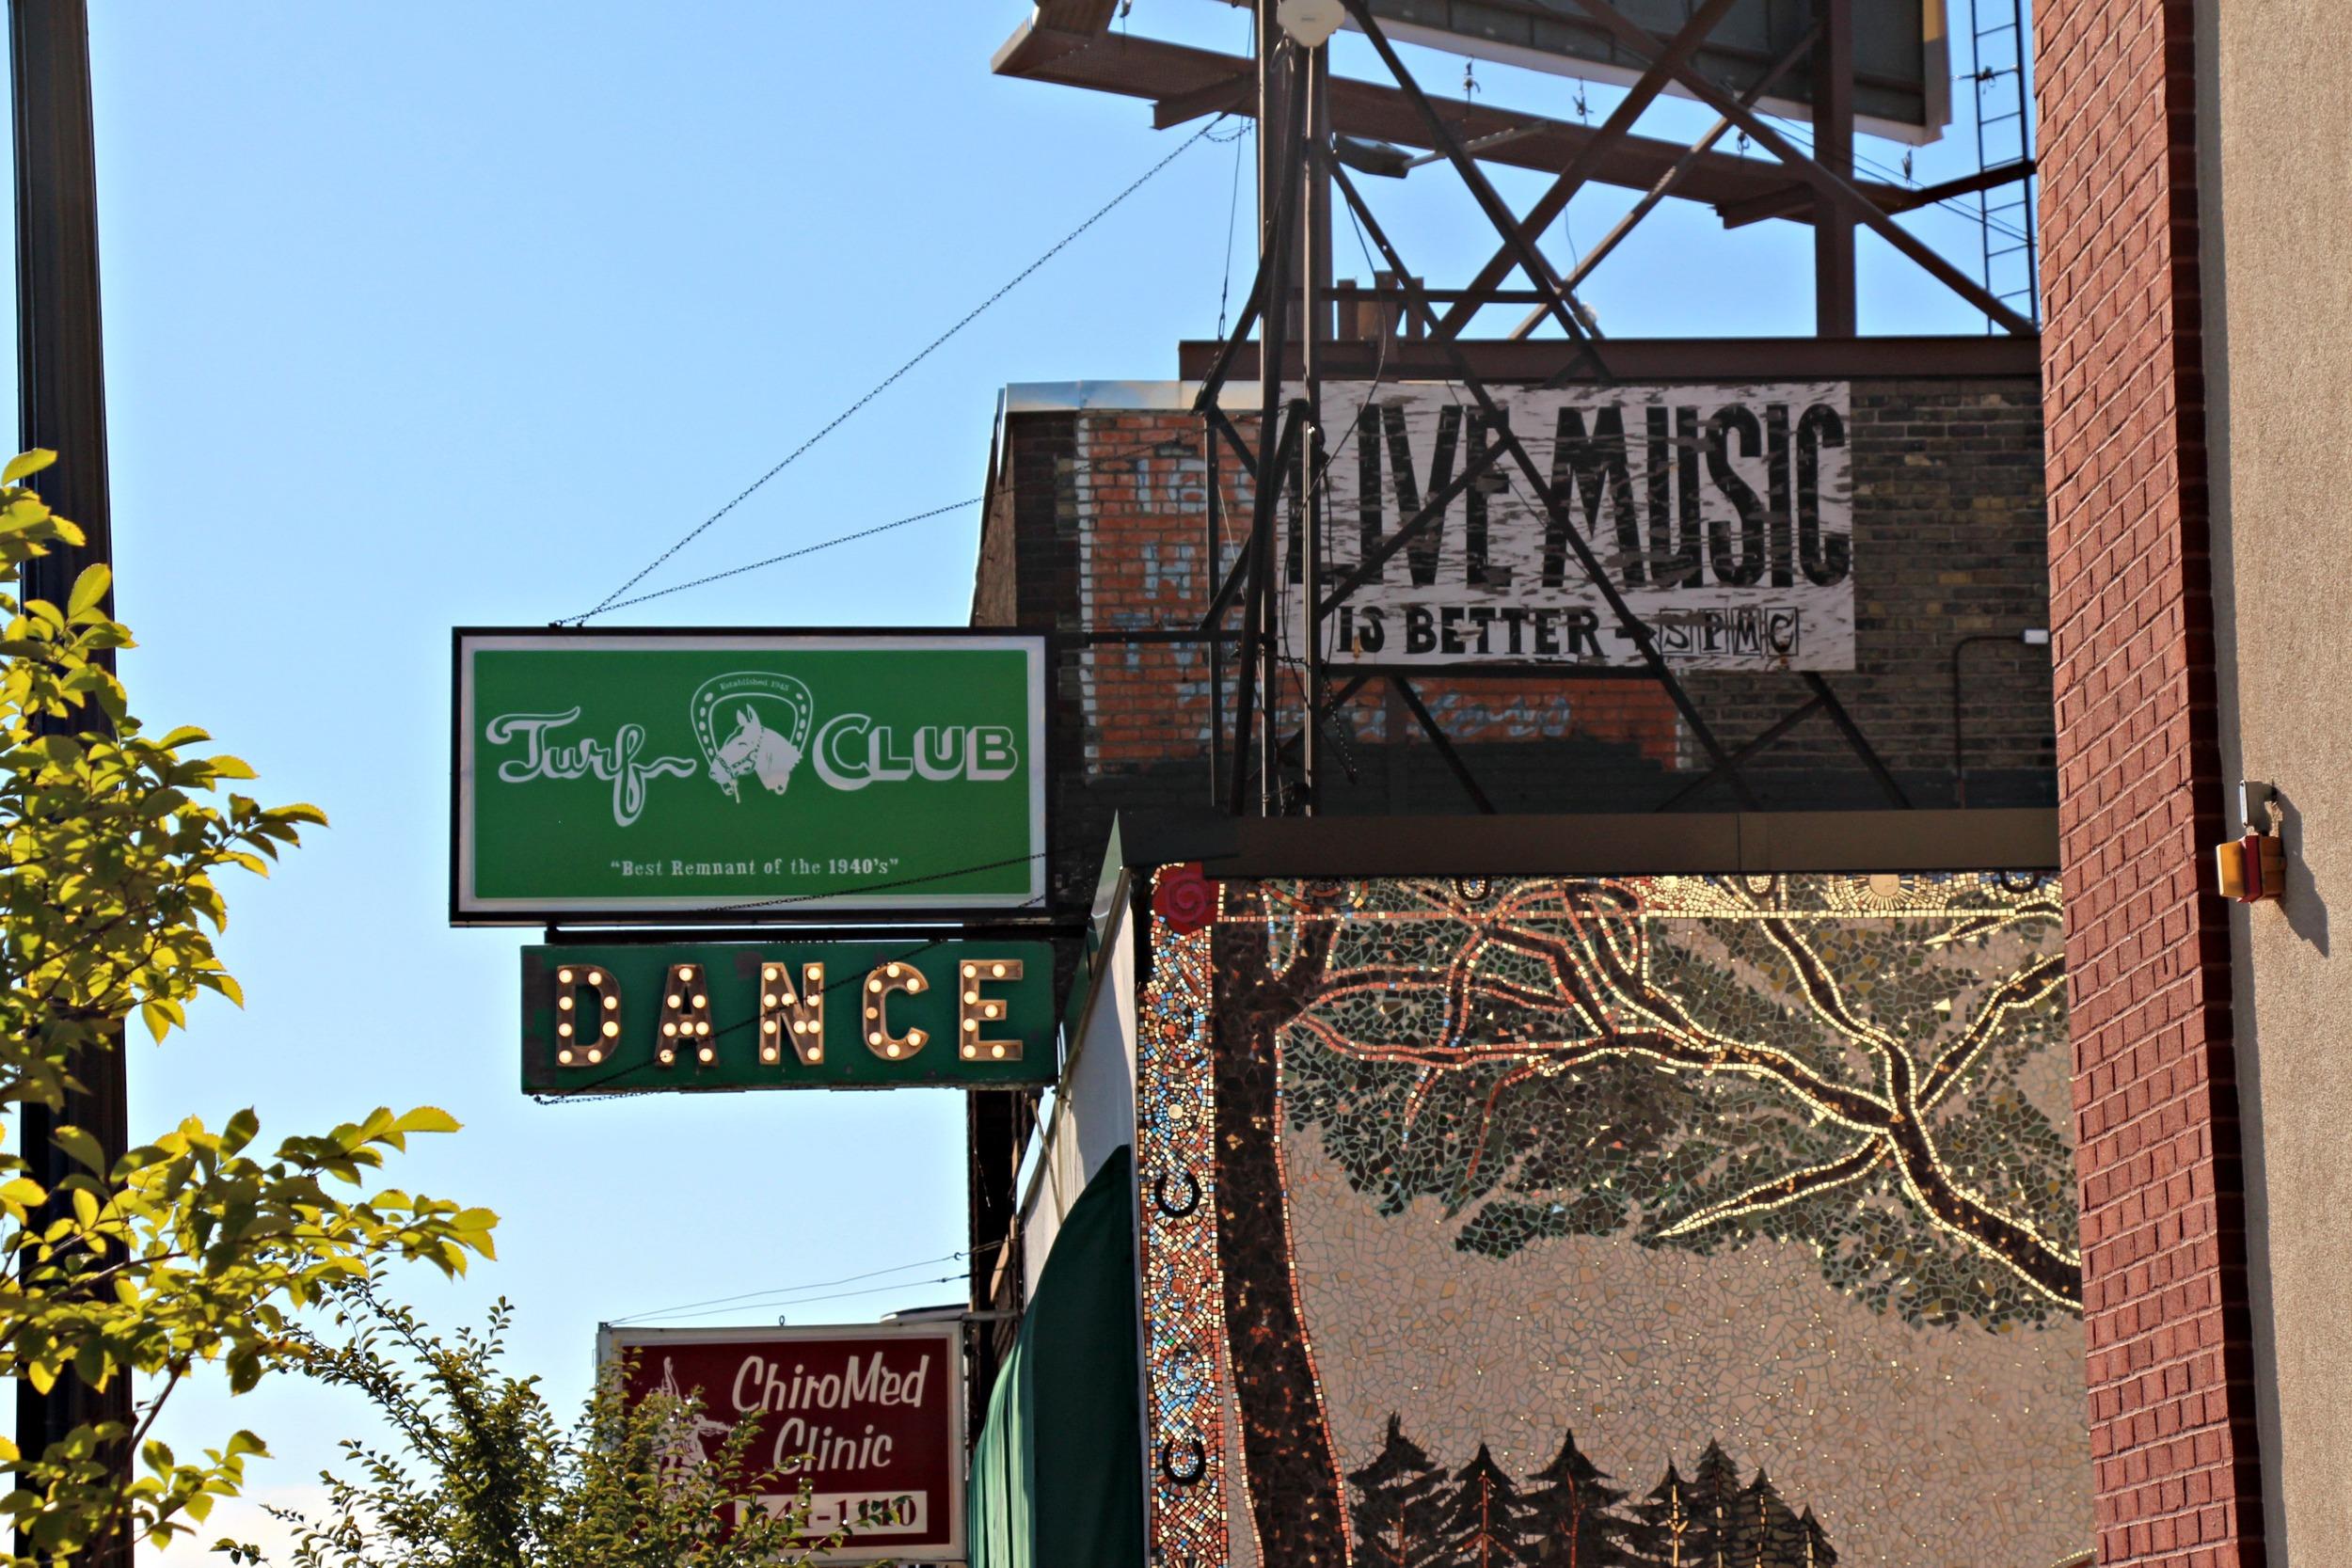 Turf Club in St. Paul